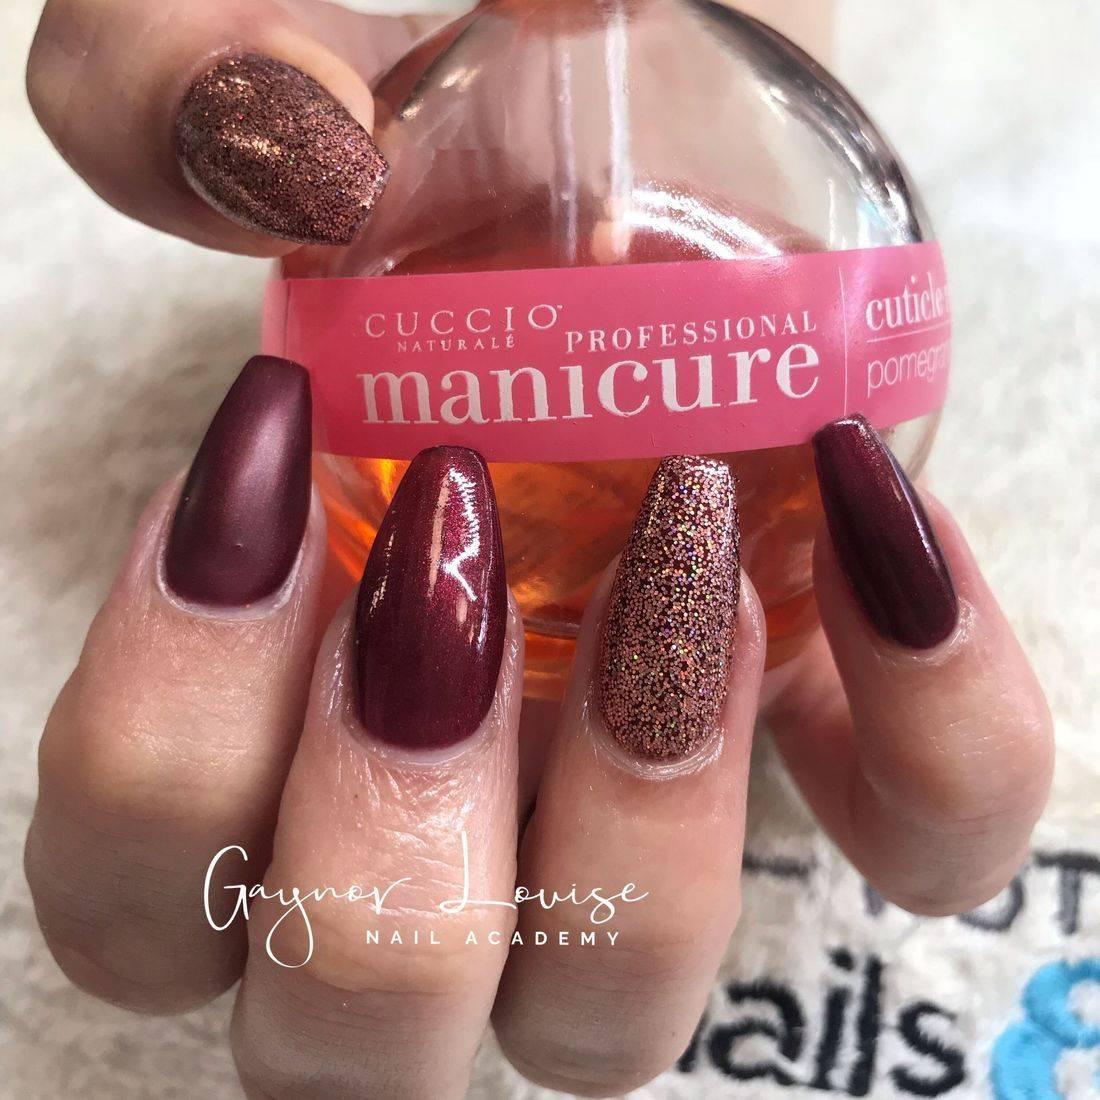 nail training, nail courses, nail training north west, bury, manchester, cuccio nail course, nail educator manchester, become a nail technician